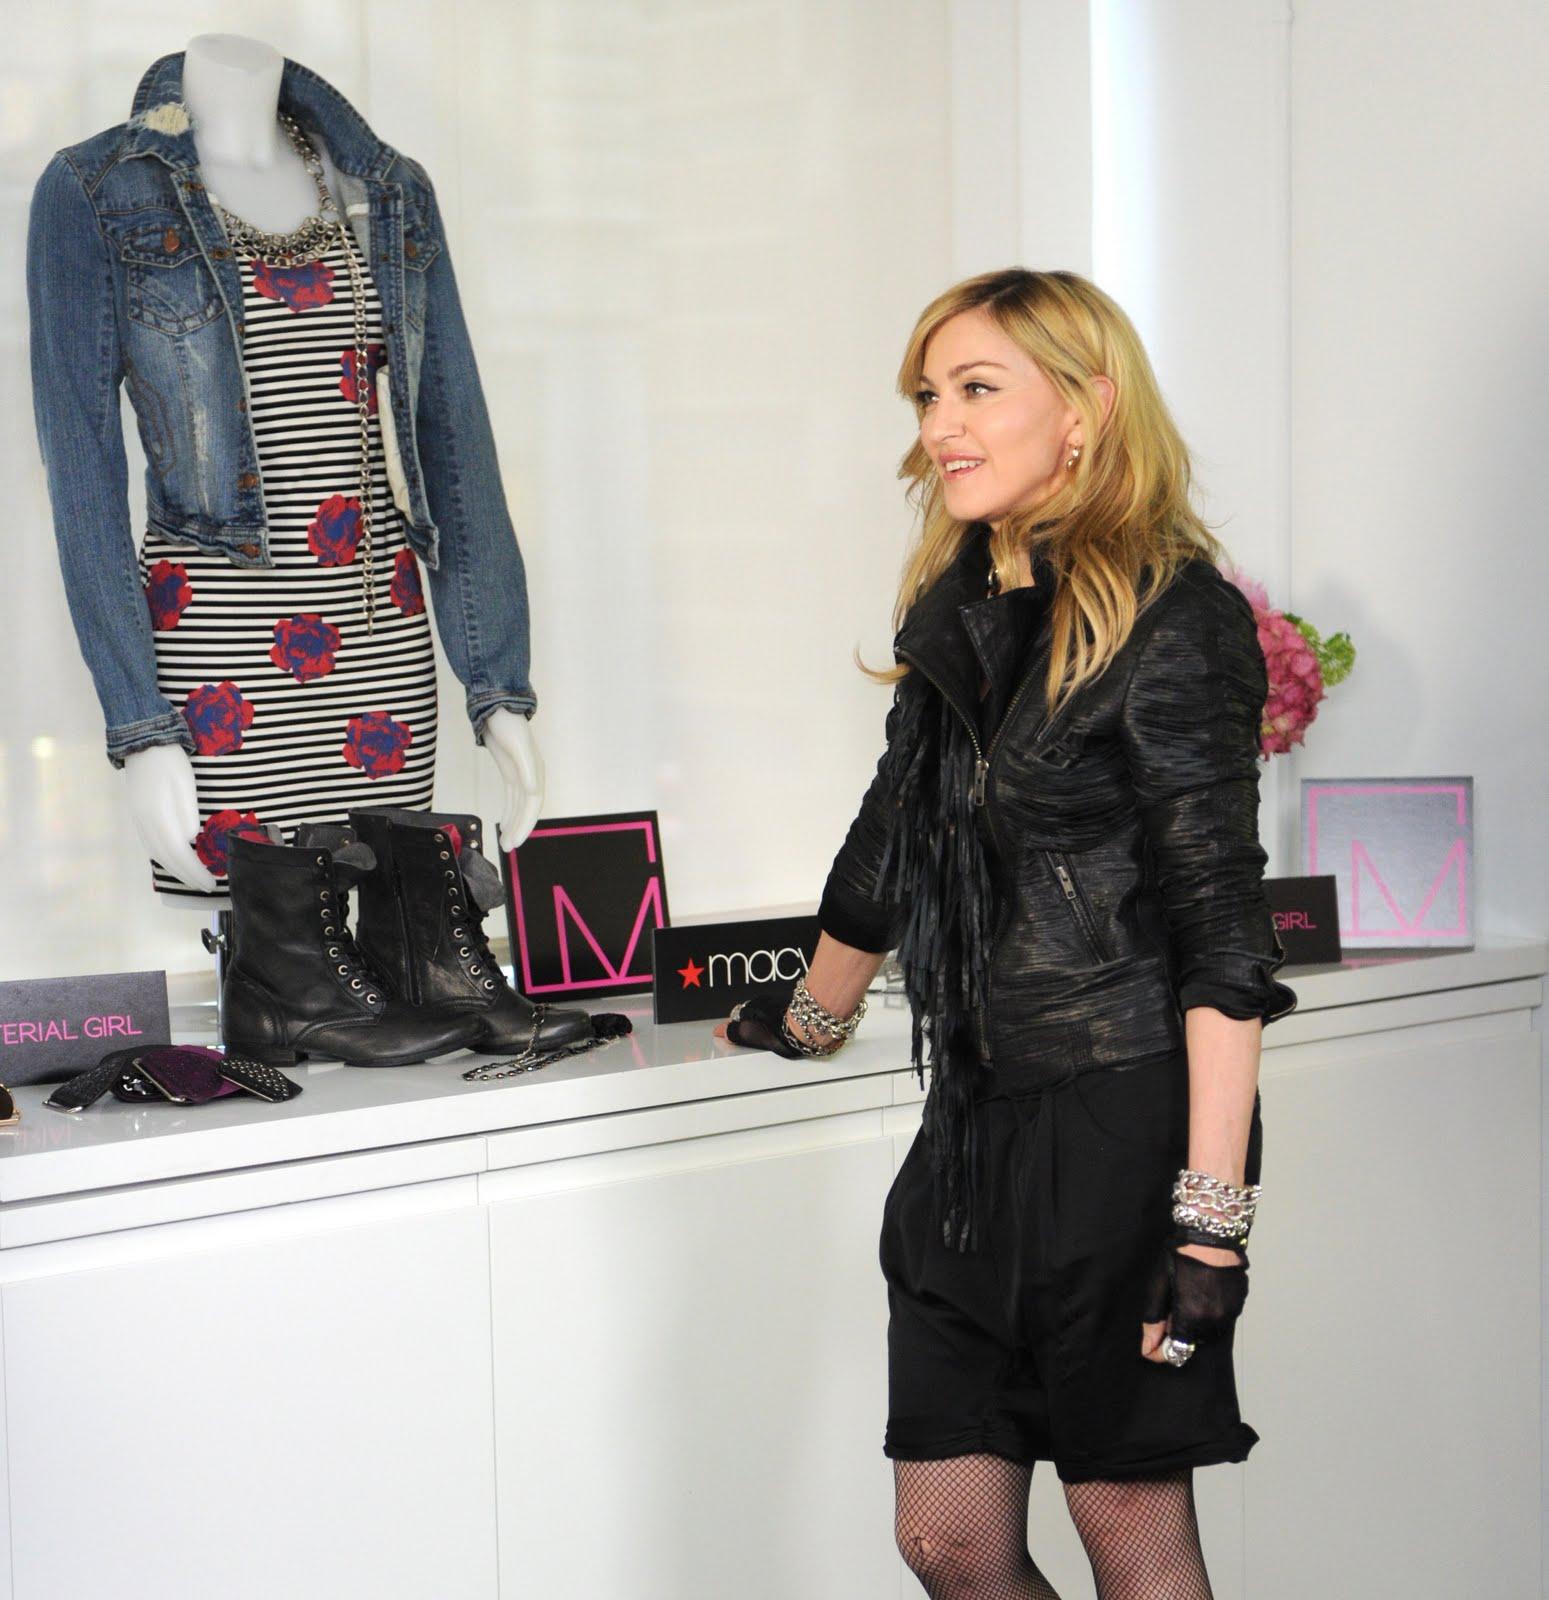 http://2.bp.blogspot.com/_sX-7kCVz-uk/TFWk-d2NDBI/AAAAAAAABdw/nPo6ohcarCE/s1600/Madonna-3.JPG.jpeg